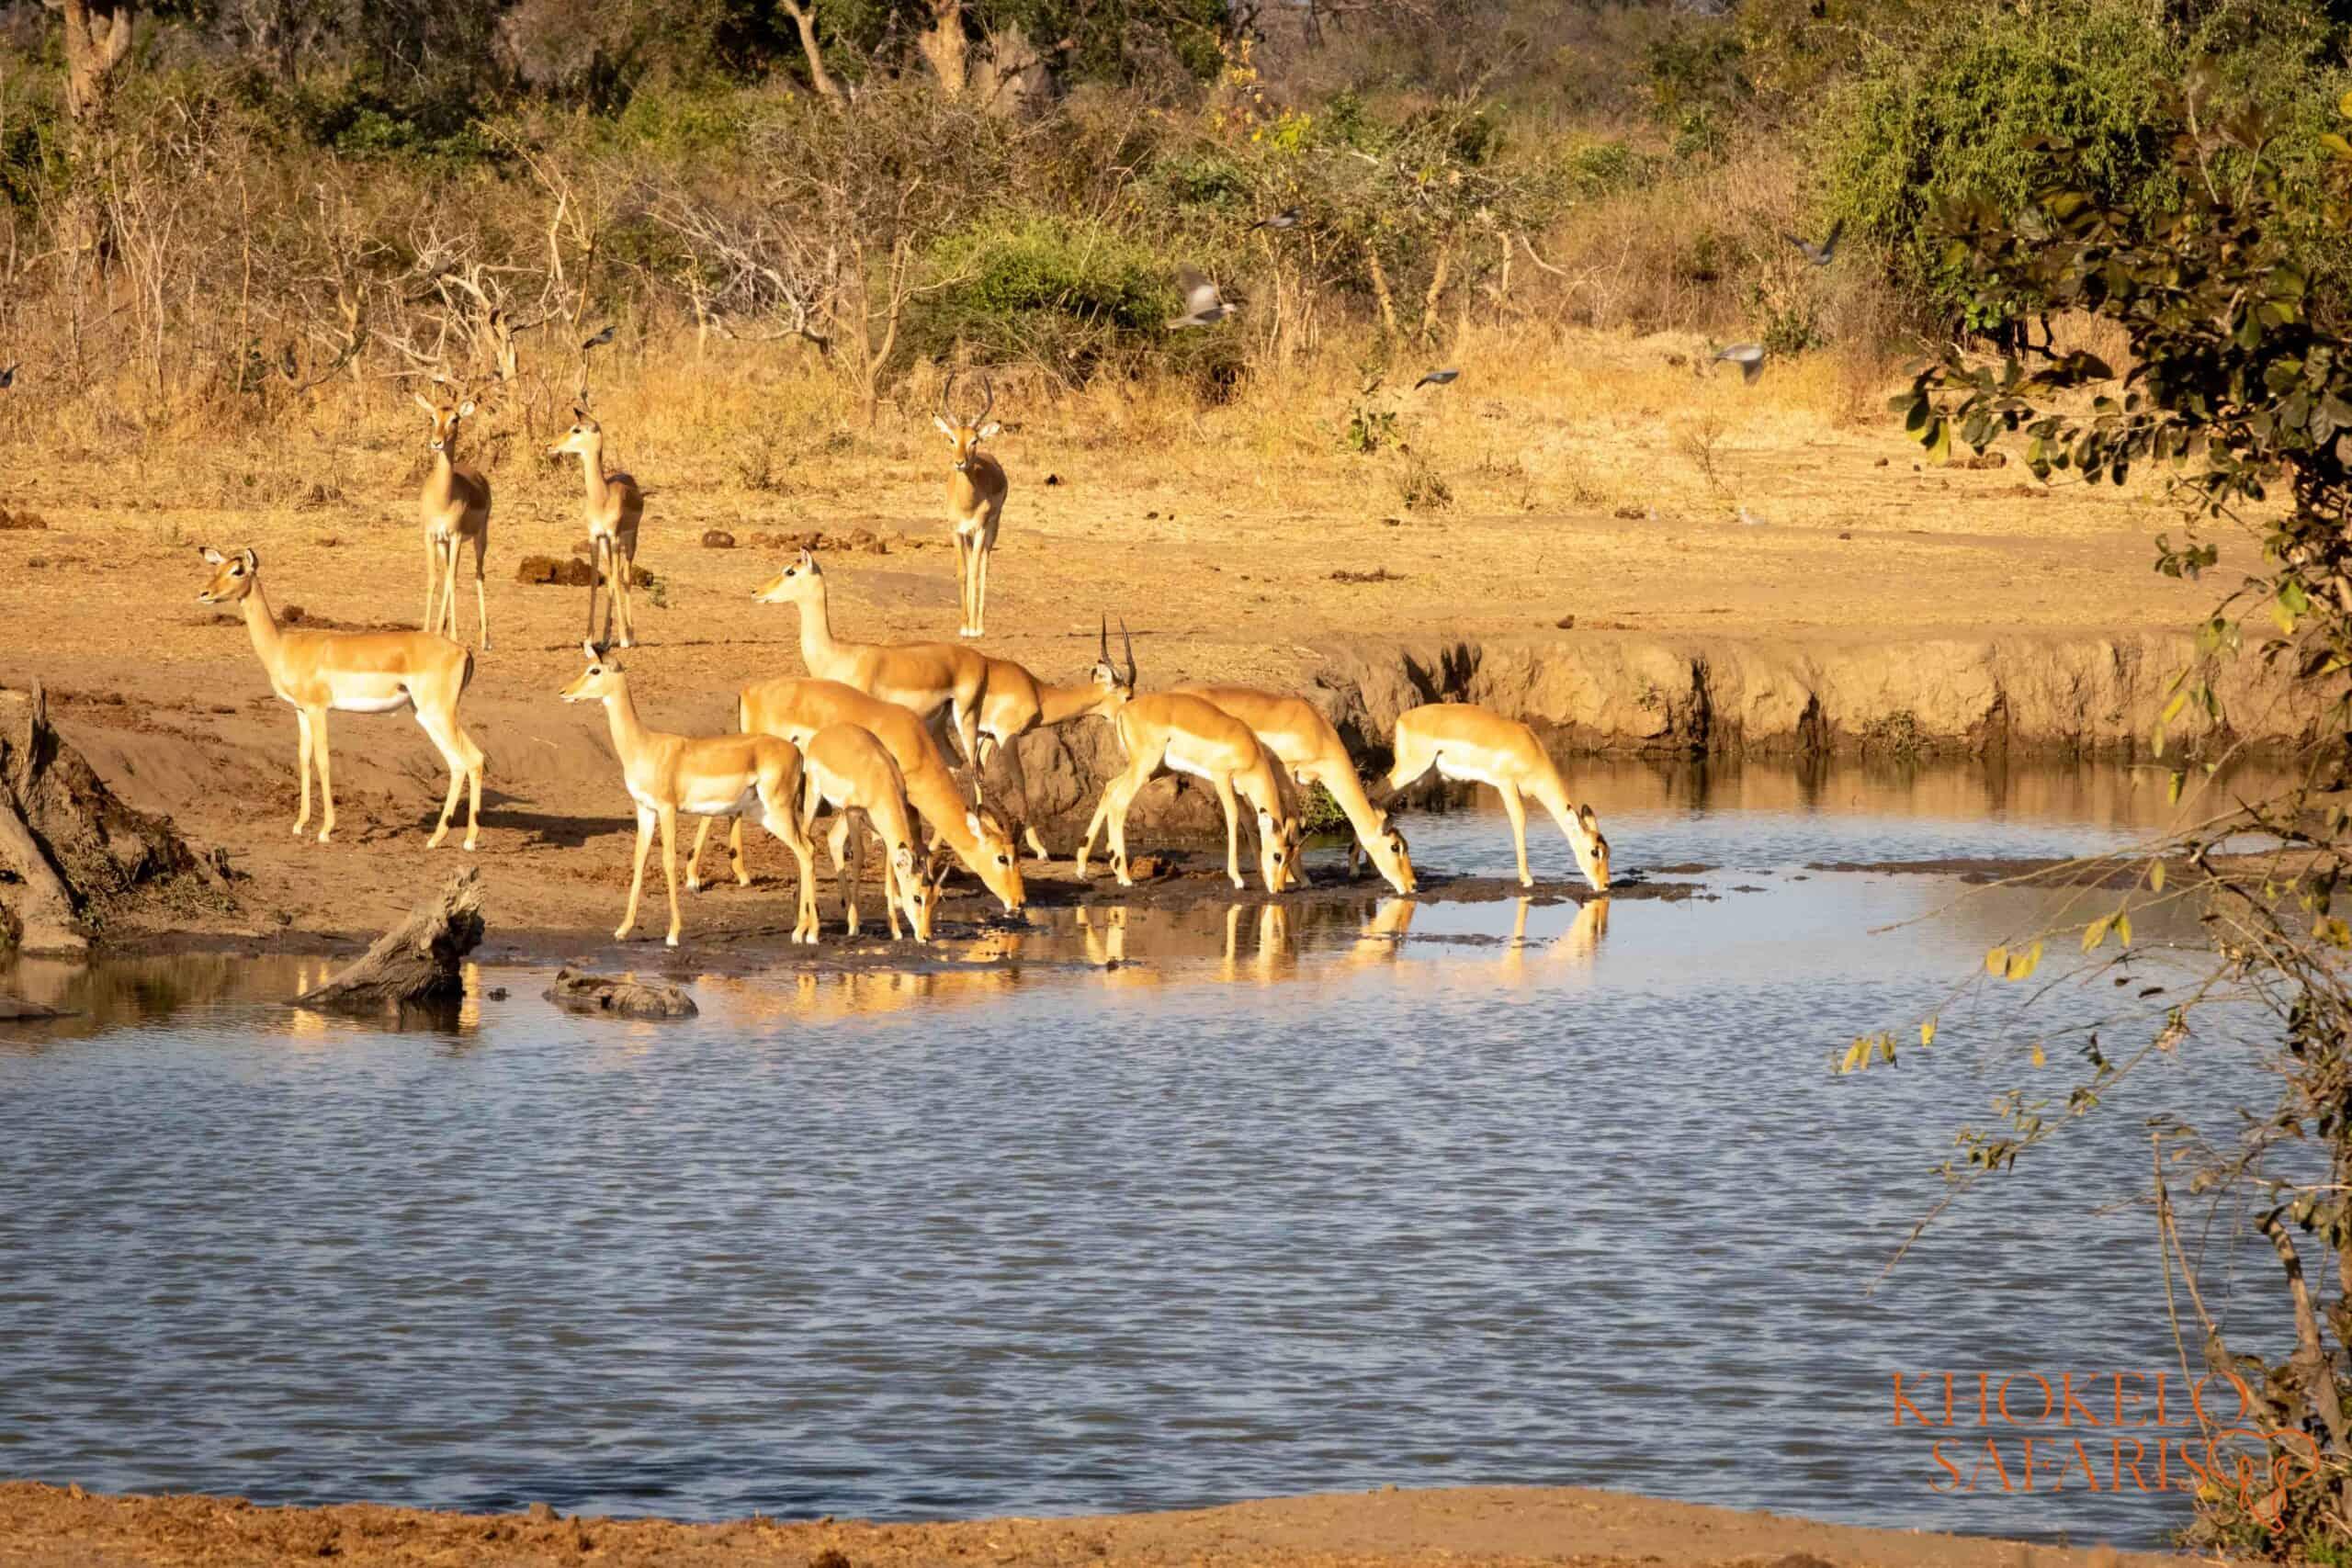 Impalas drinking from river selfdrive Zambia